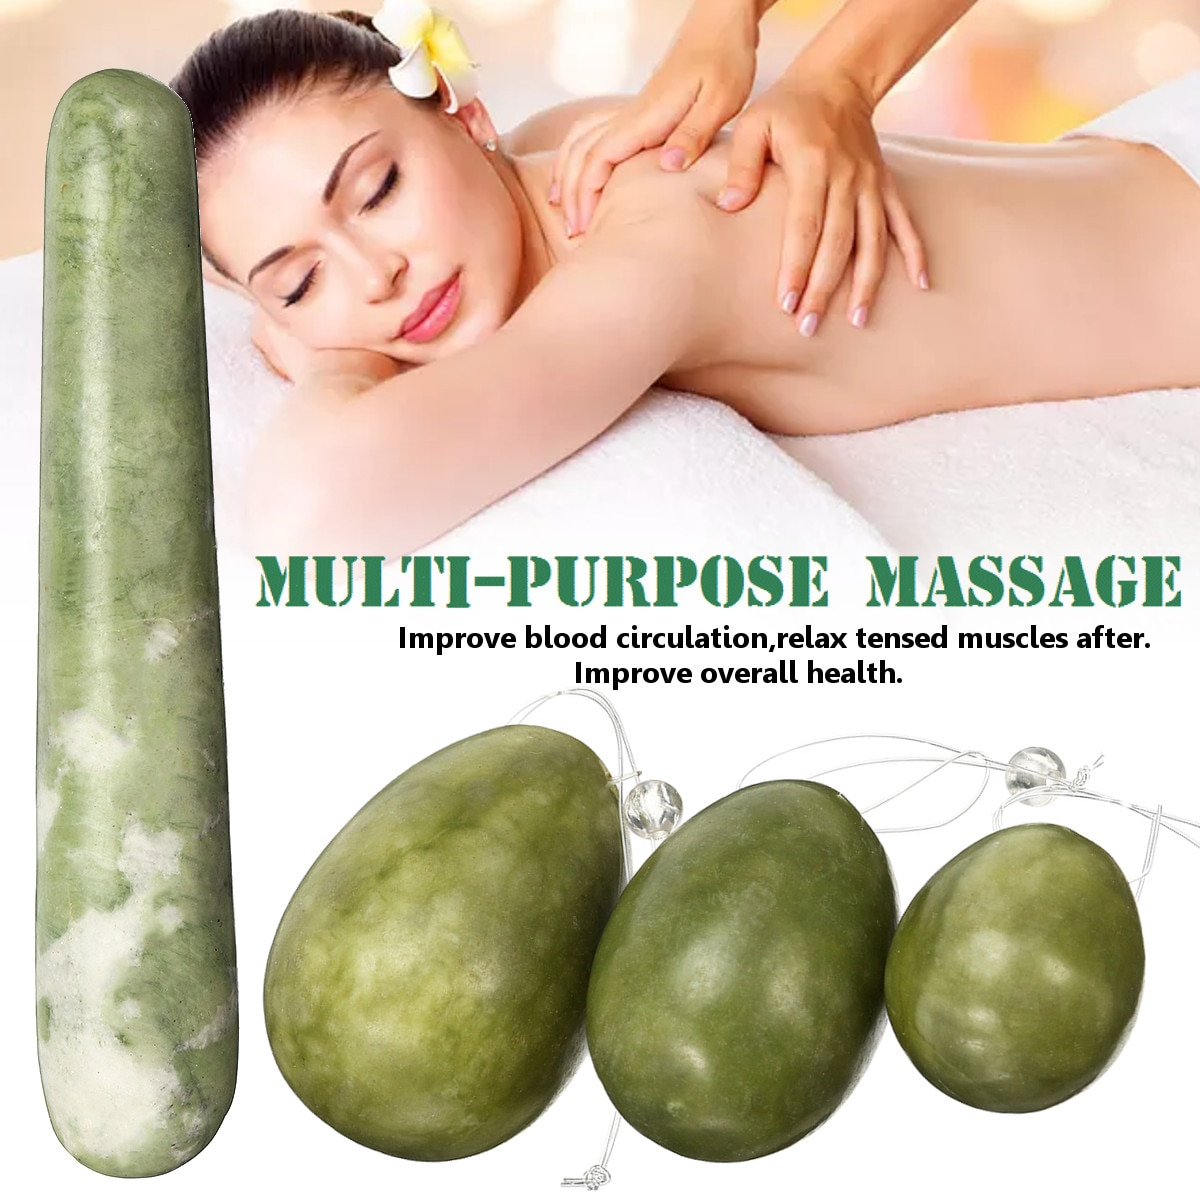 4pcs/set Green Quartz Yoni Egg Jade Eggs Women Kegel Exerciser Jade Massager Vaginal Muscles Tightening Ball Crystal Kegel Eggs